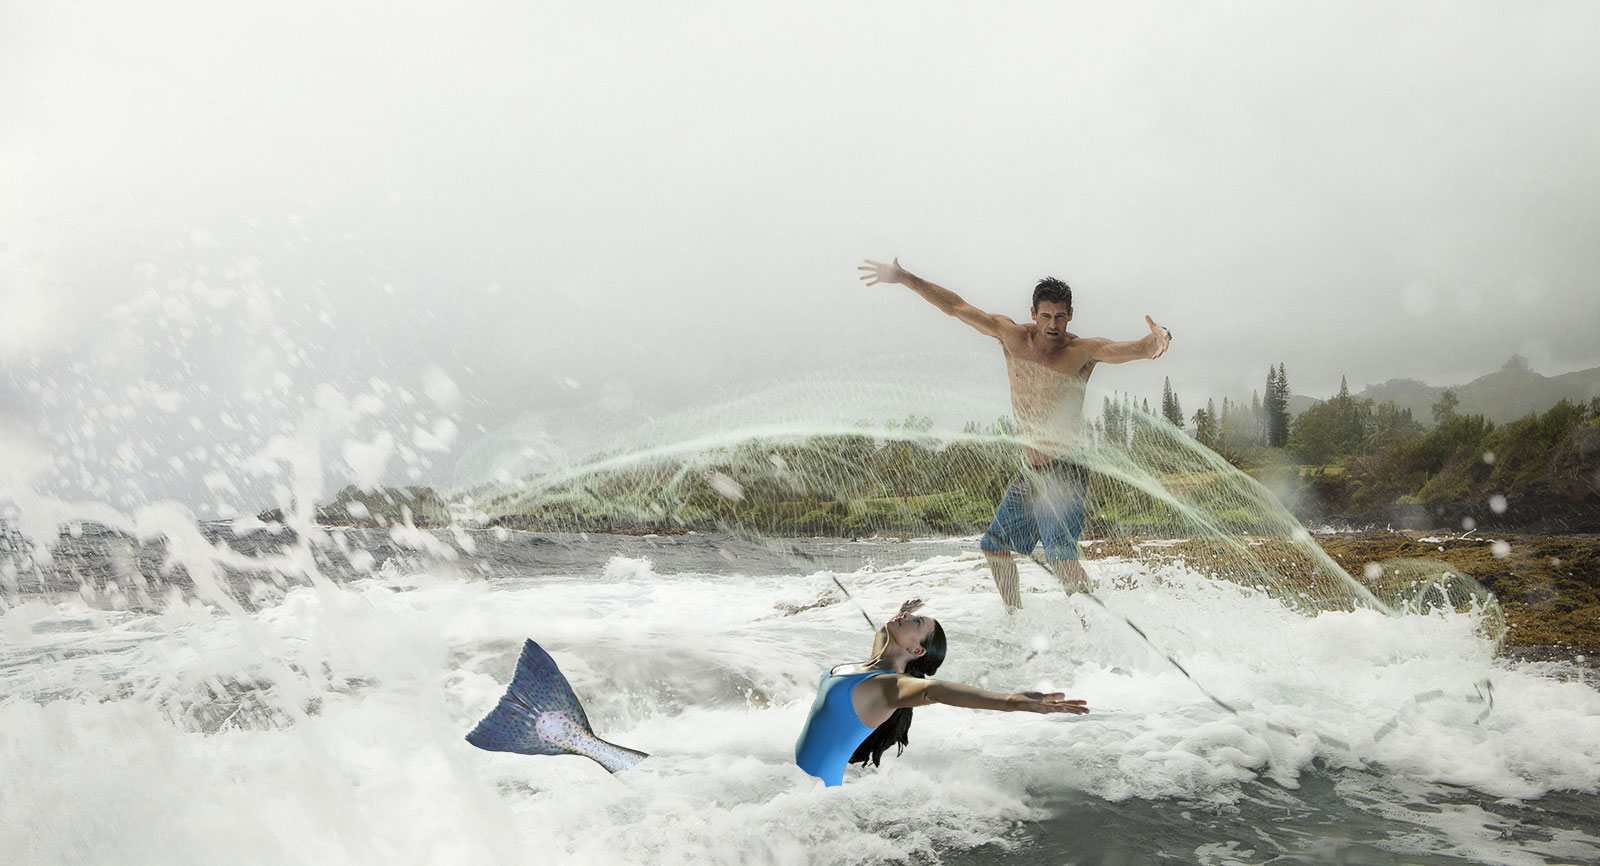 Throw Net Mermaid Fishing